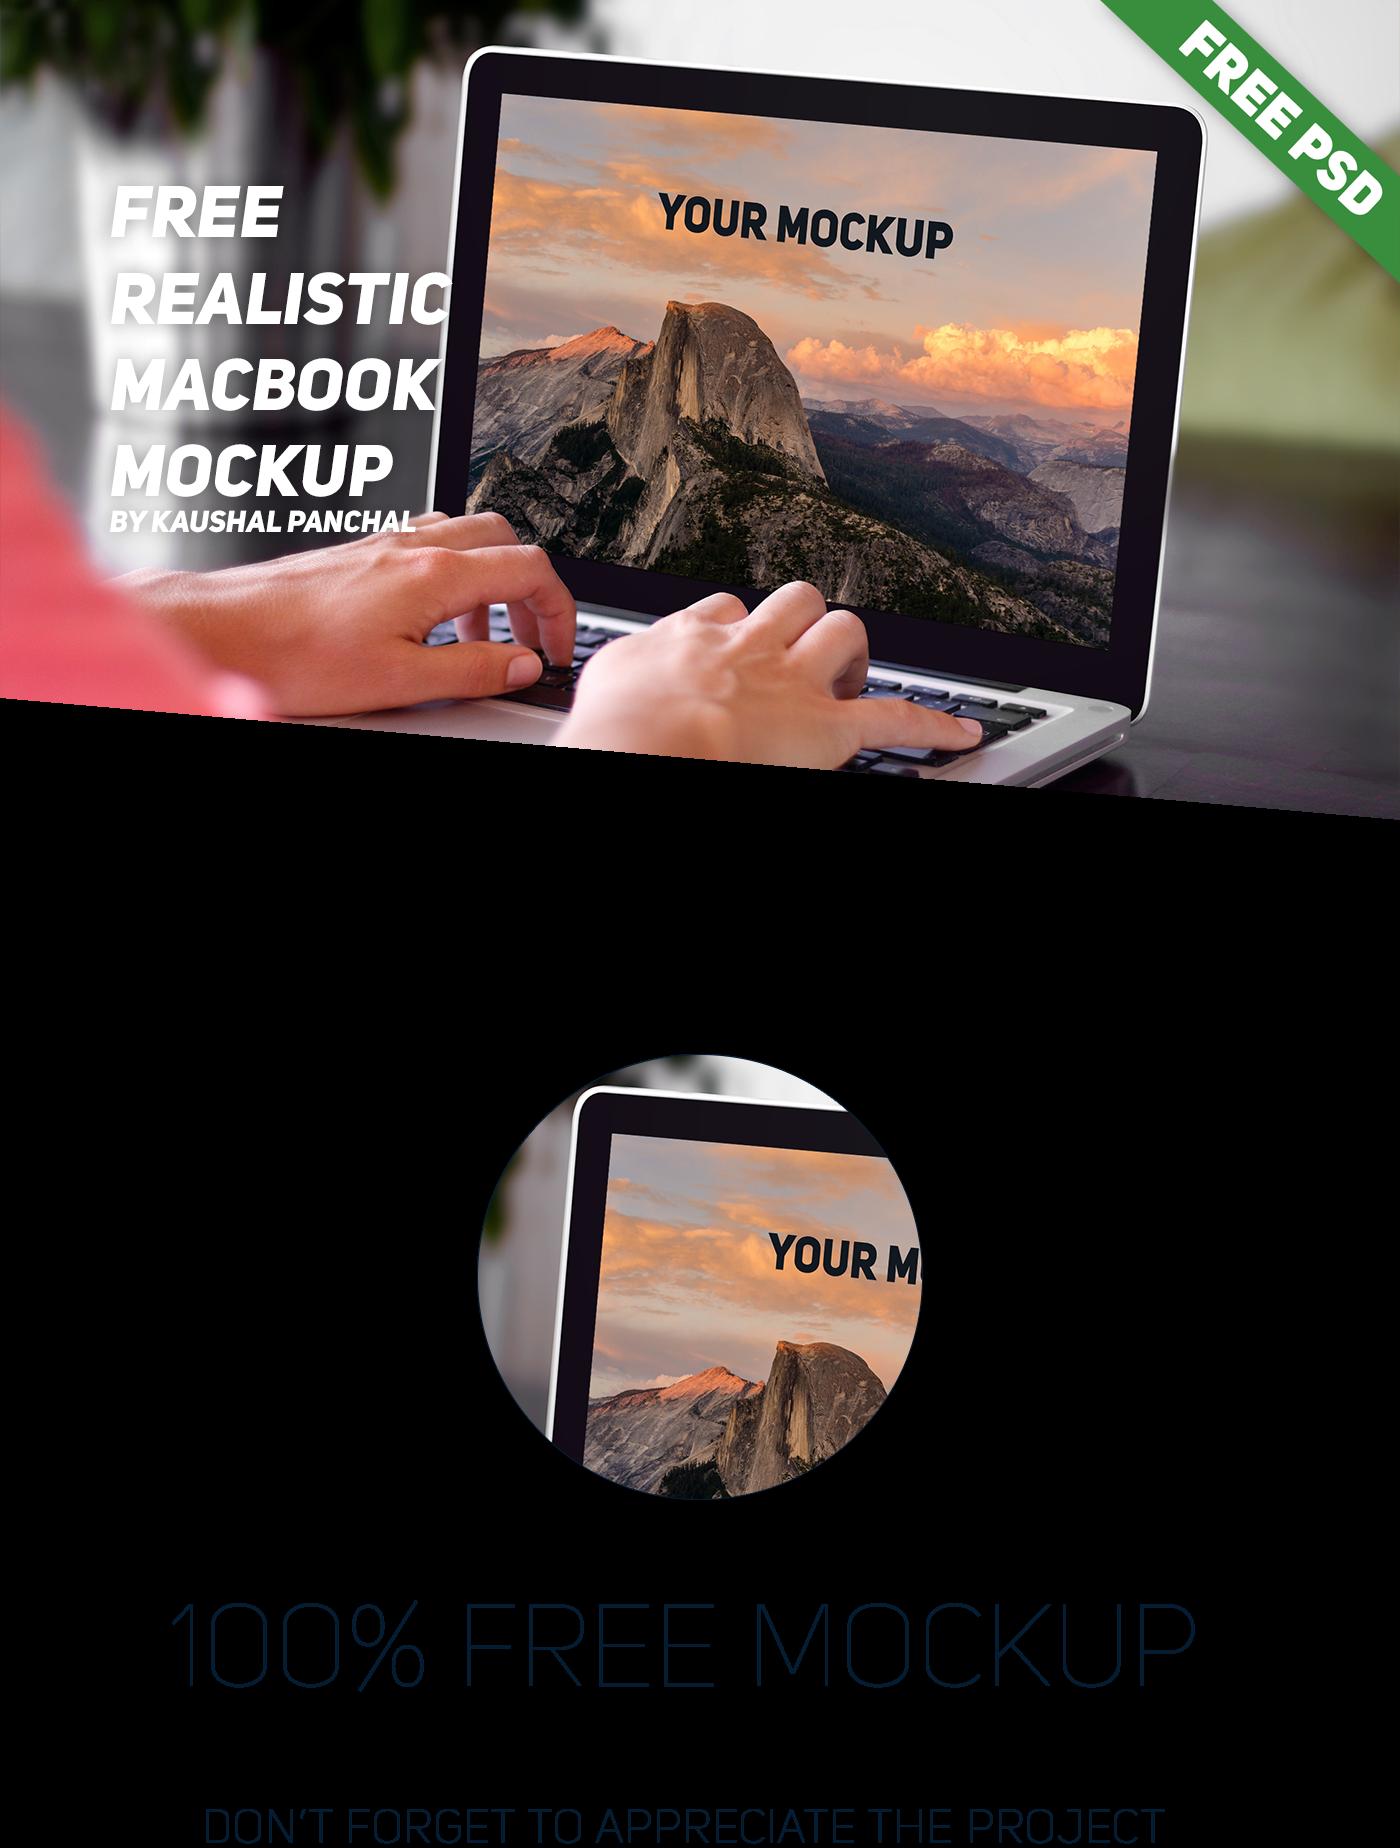 macbook mockup free psd free mockup  psd mockup realistic mockup free psd mockup free realistic mockup macbook pro macbook pro psd macbook pro psdmockup free